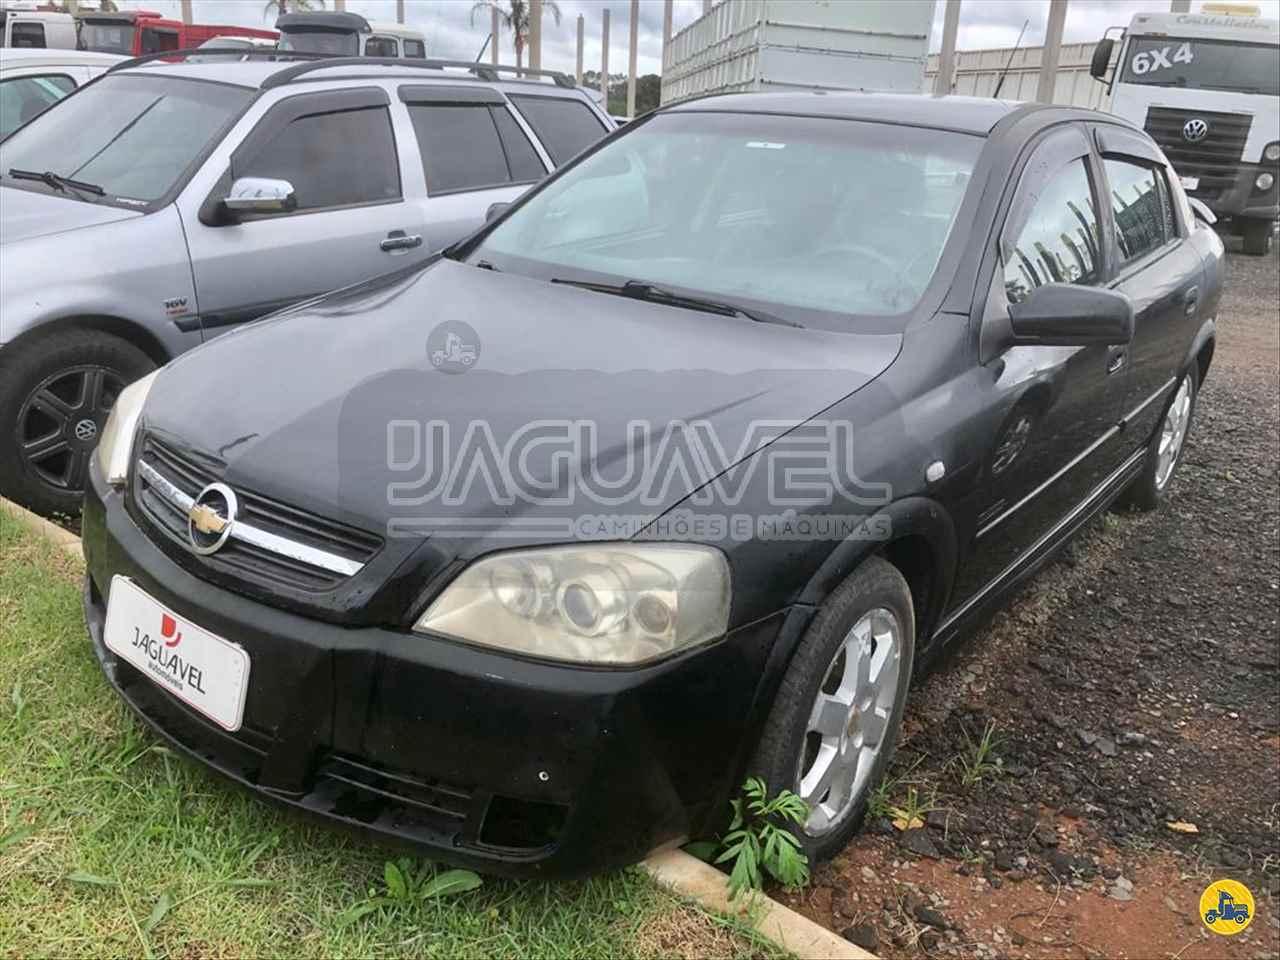 Astra 2.0 Advantage de Jaguavel Caminhões - JAGUARIAIVA/PR